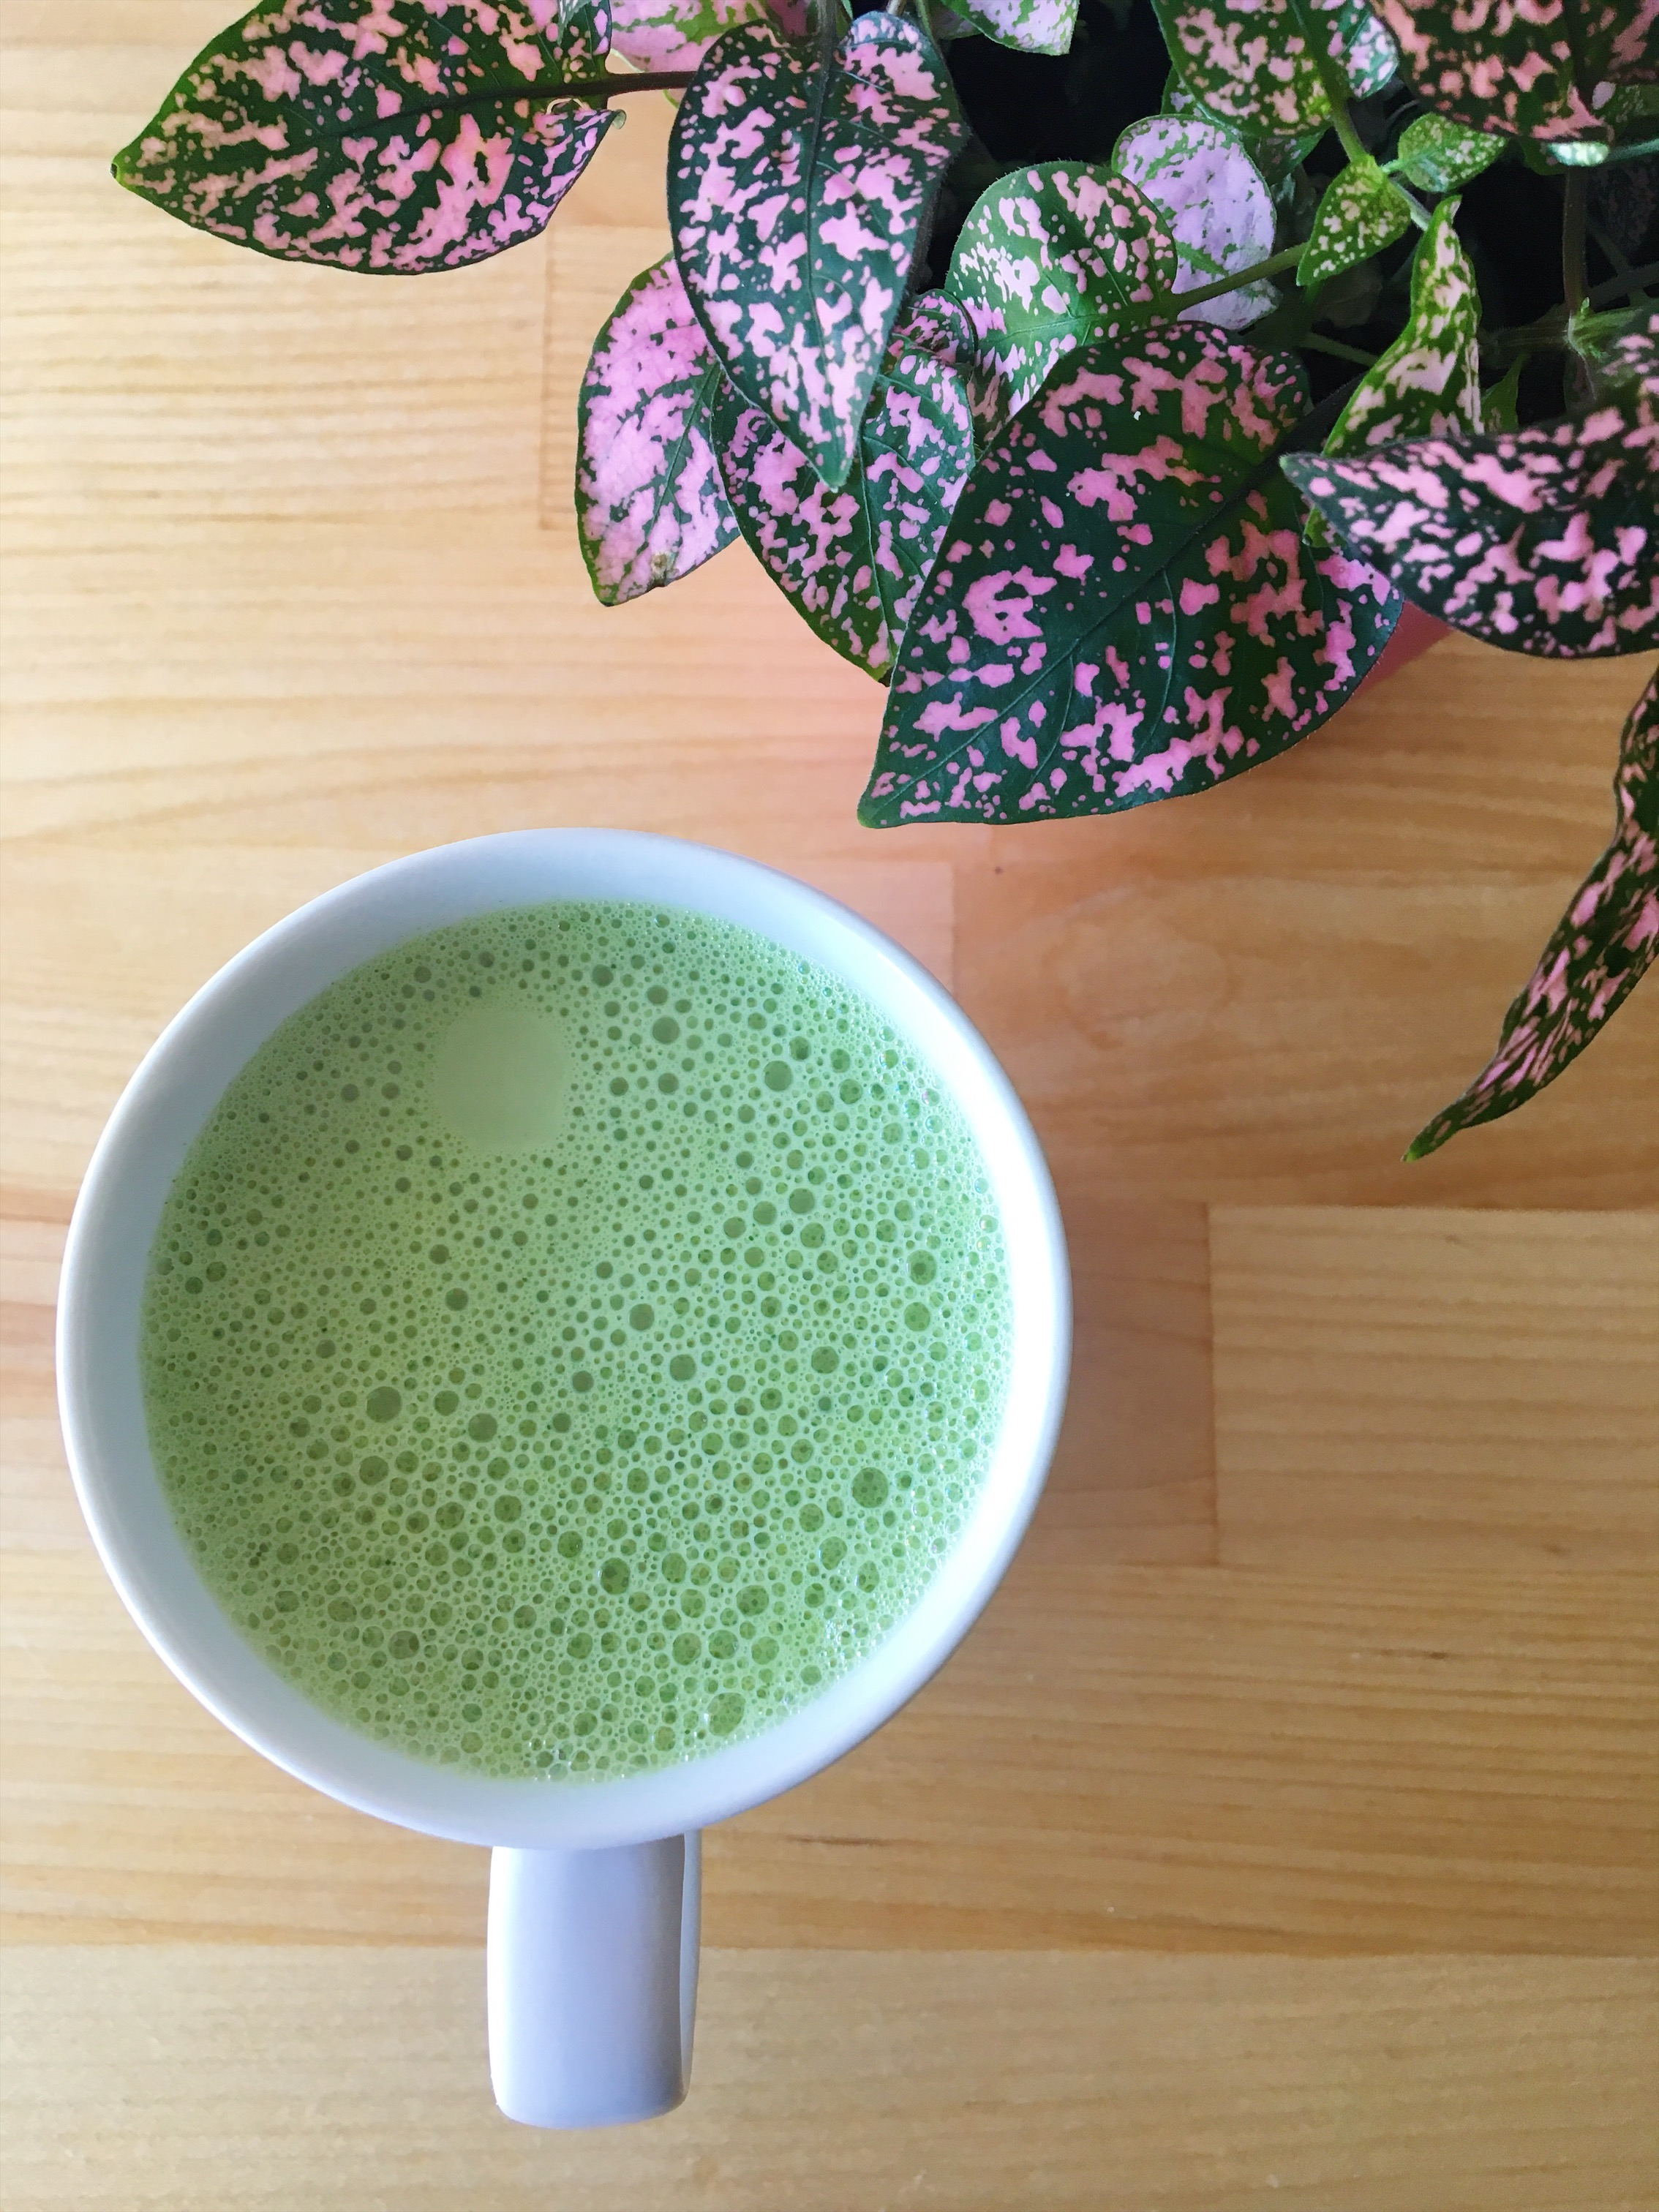 Matcha Latte 101: Make The Perfect Green Tea Latte